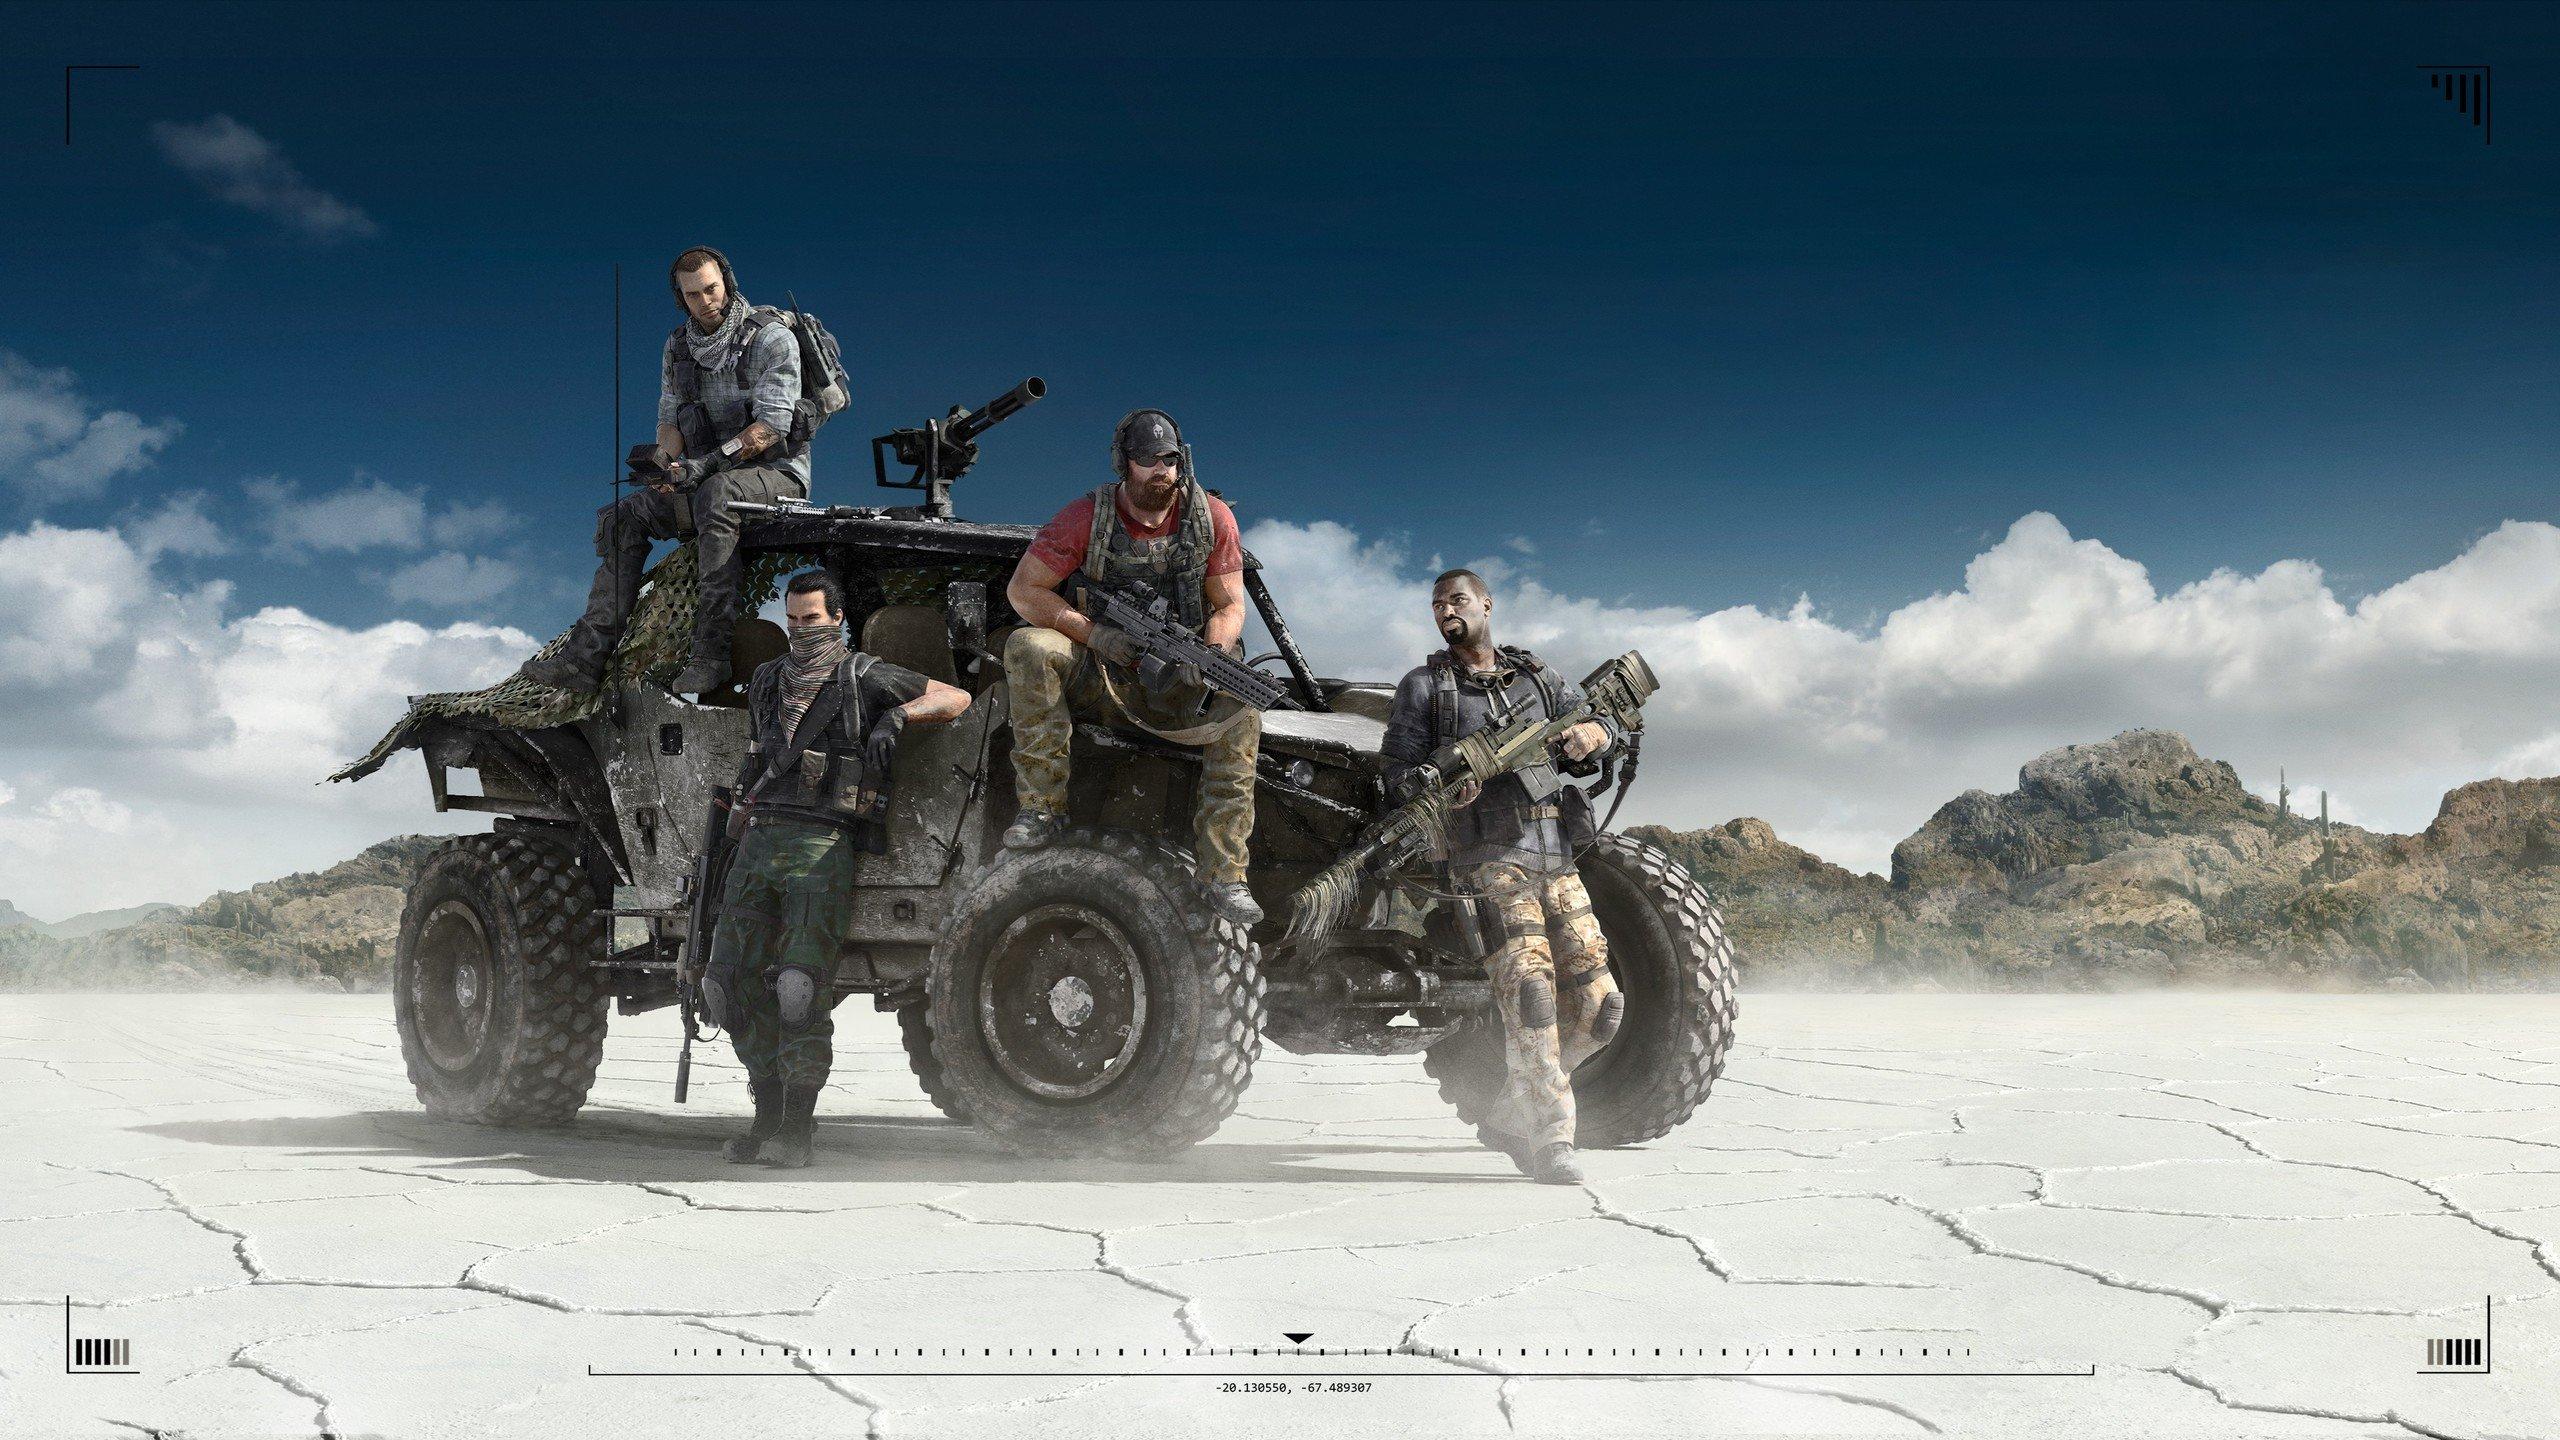 Tom Clancy's Ghost Recon Wildlands oyunu 4K Duvar kağıdı